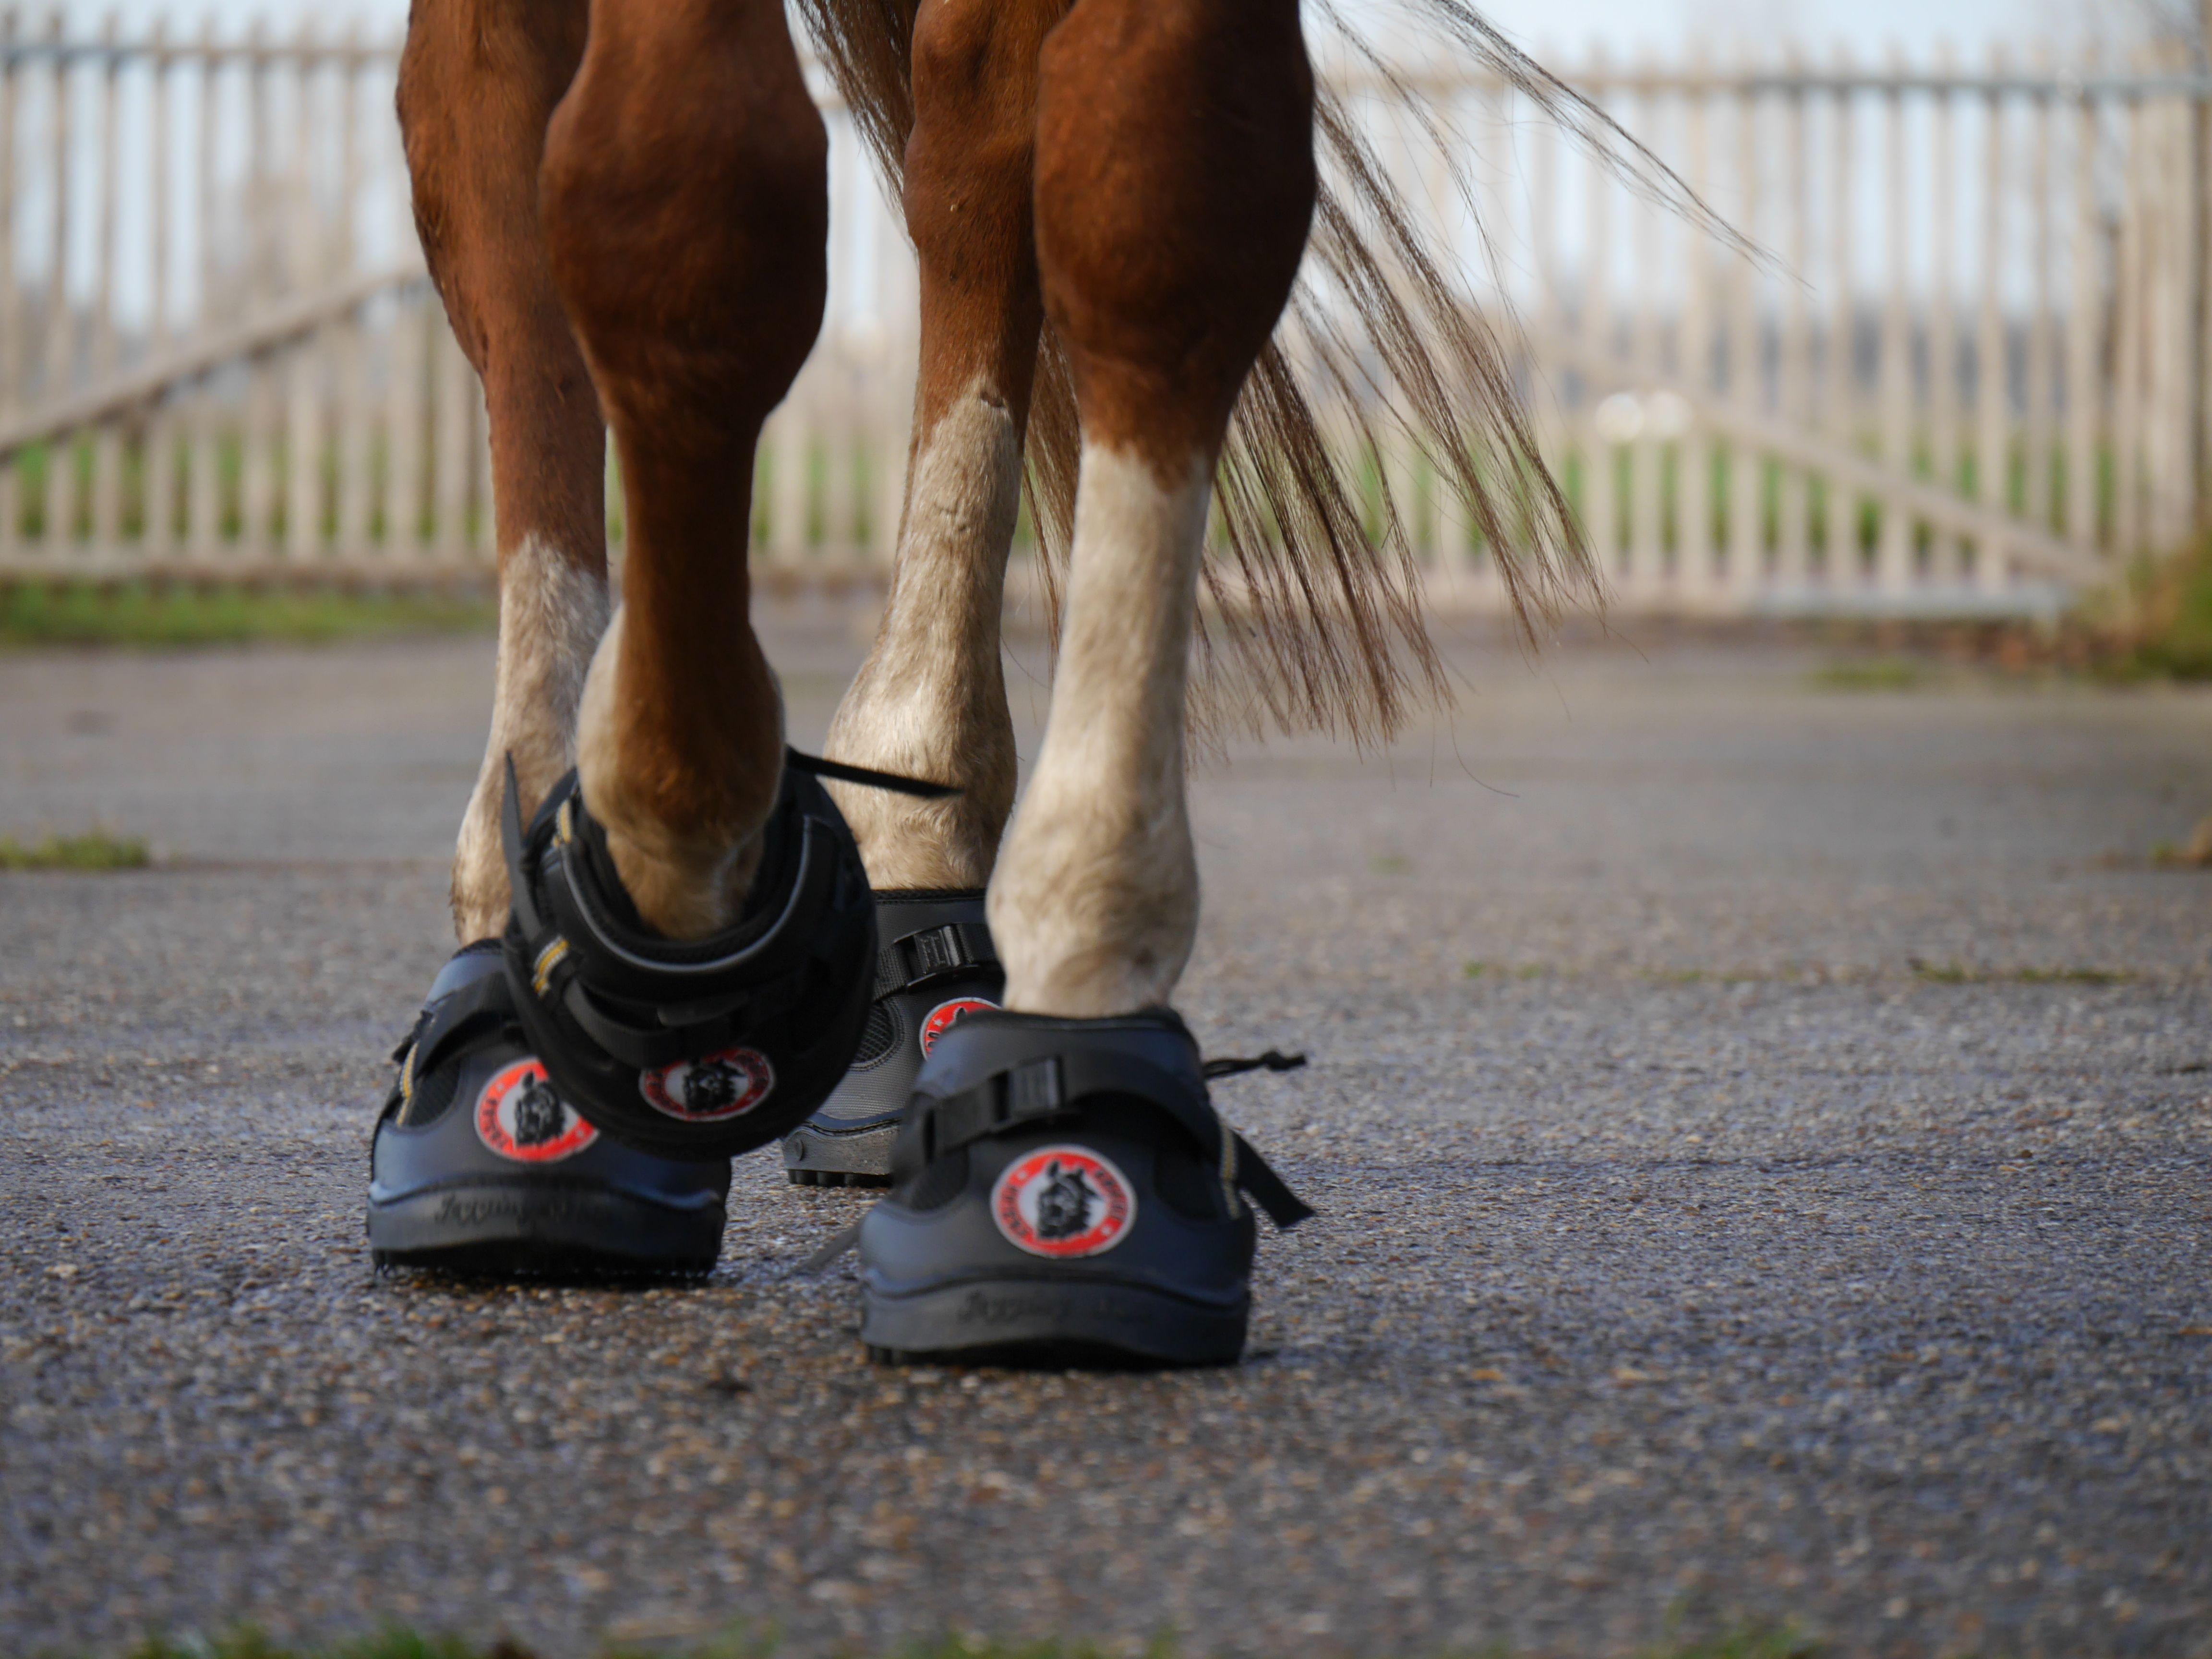 Flex hoof boots: all three sizes in stock at HoofWear